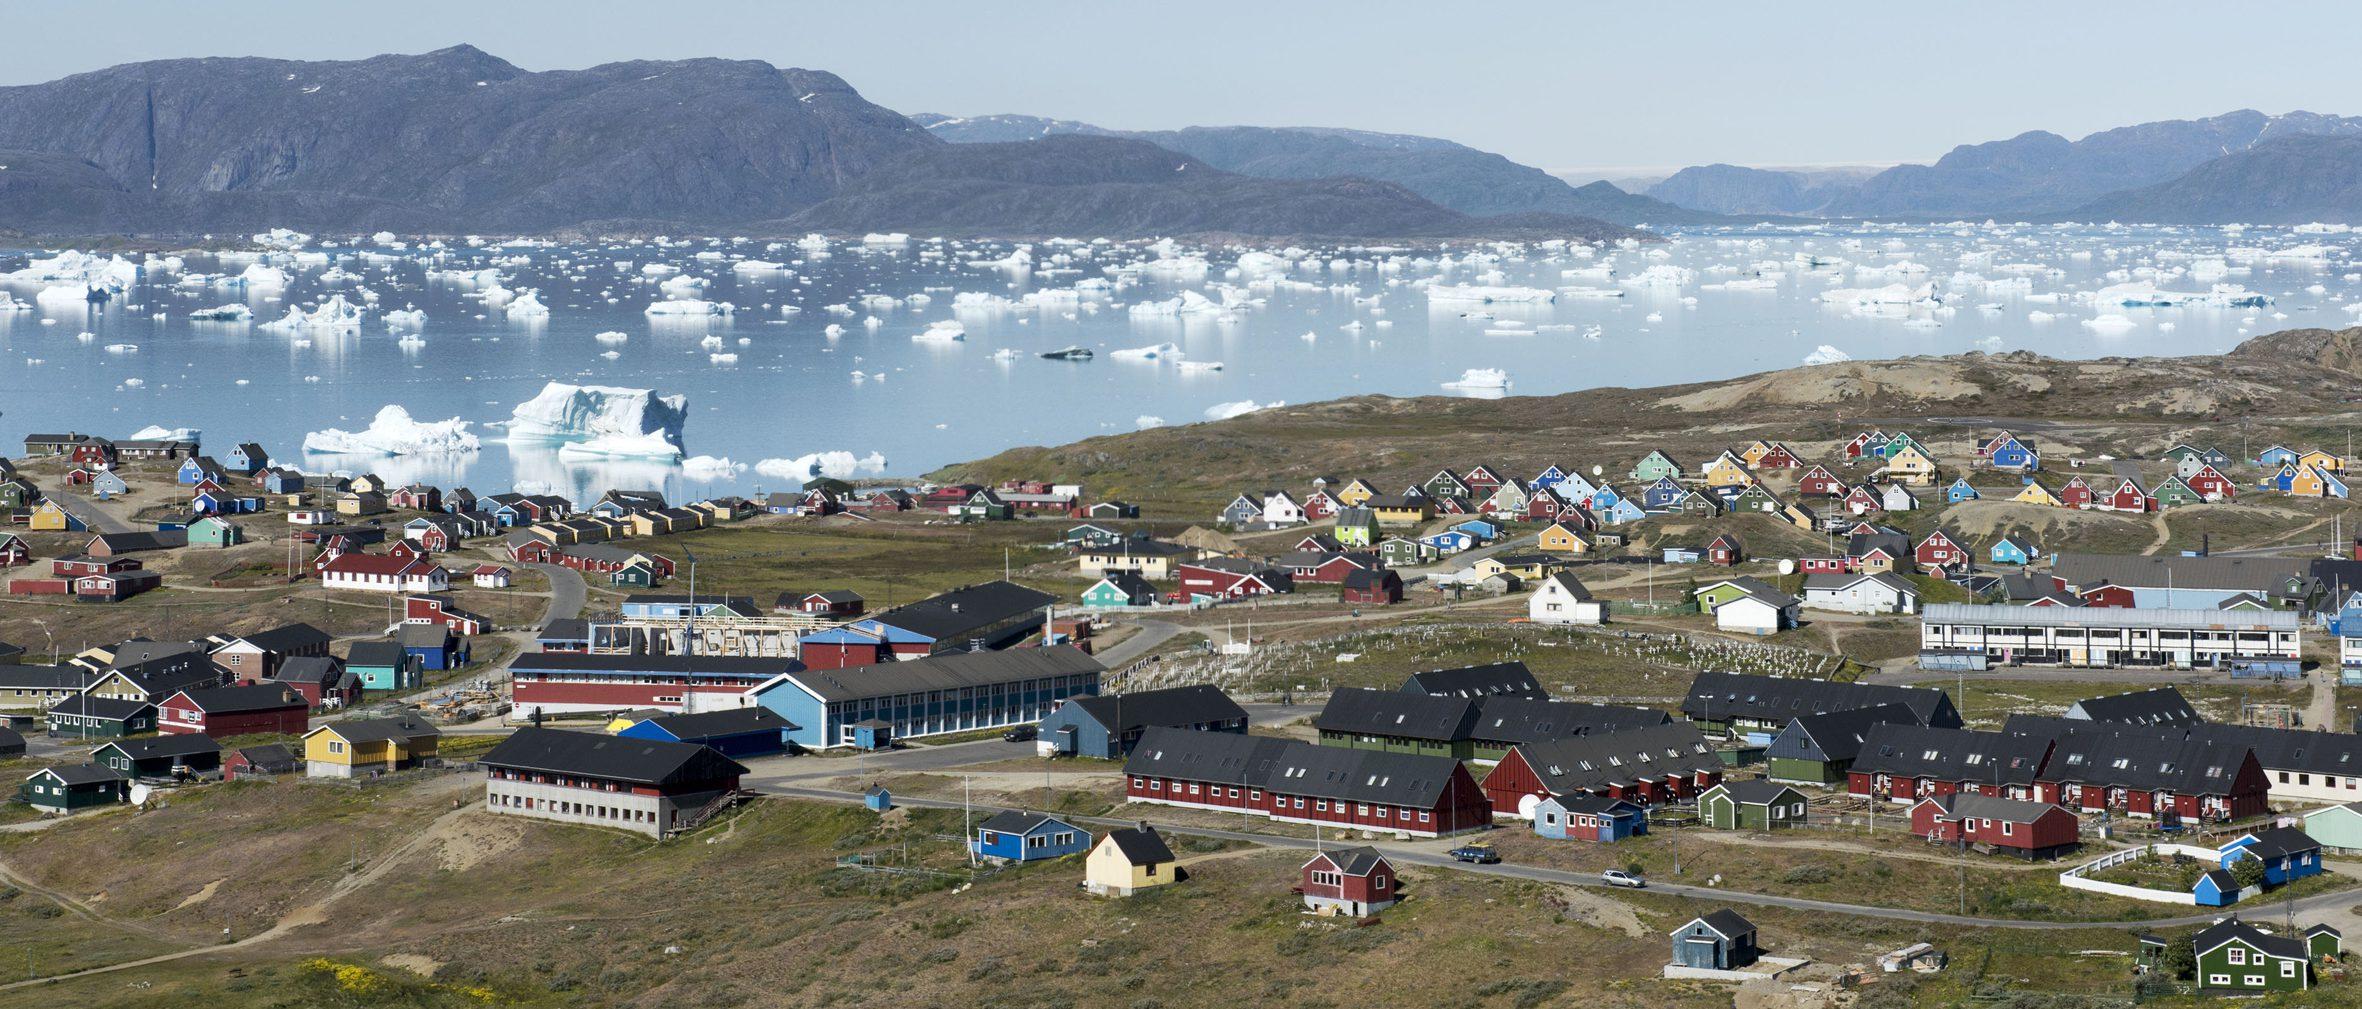 suedgroenland-siedlung-narsaq-blue-ice-explorer-panorama